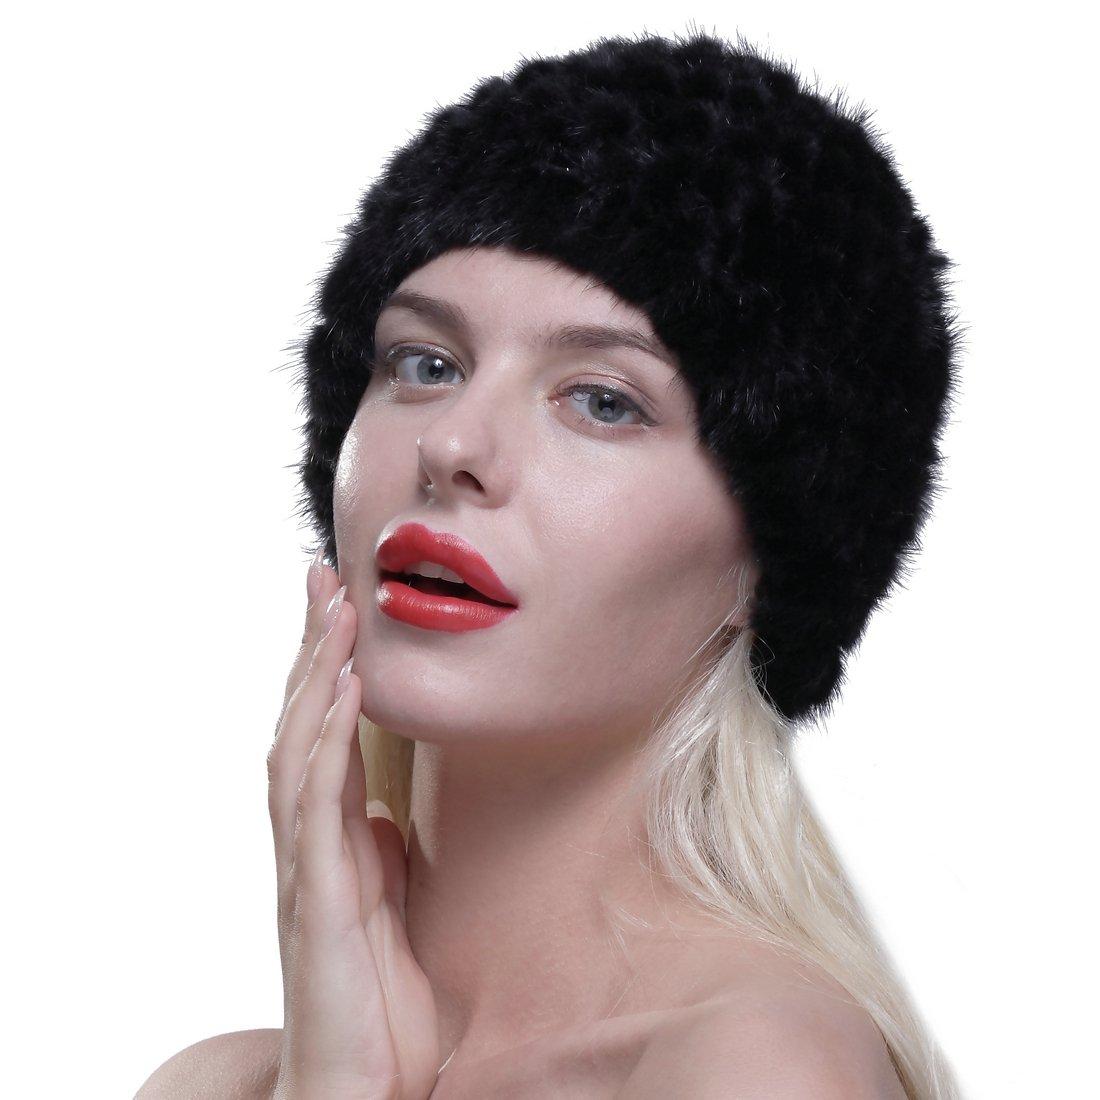 URSFUR Womens Fur Hat Real Mink Fur Knit Beanie Cap Multicolor